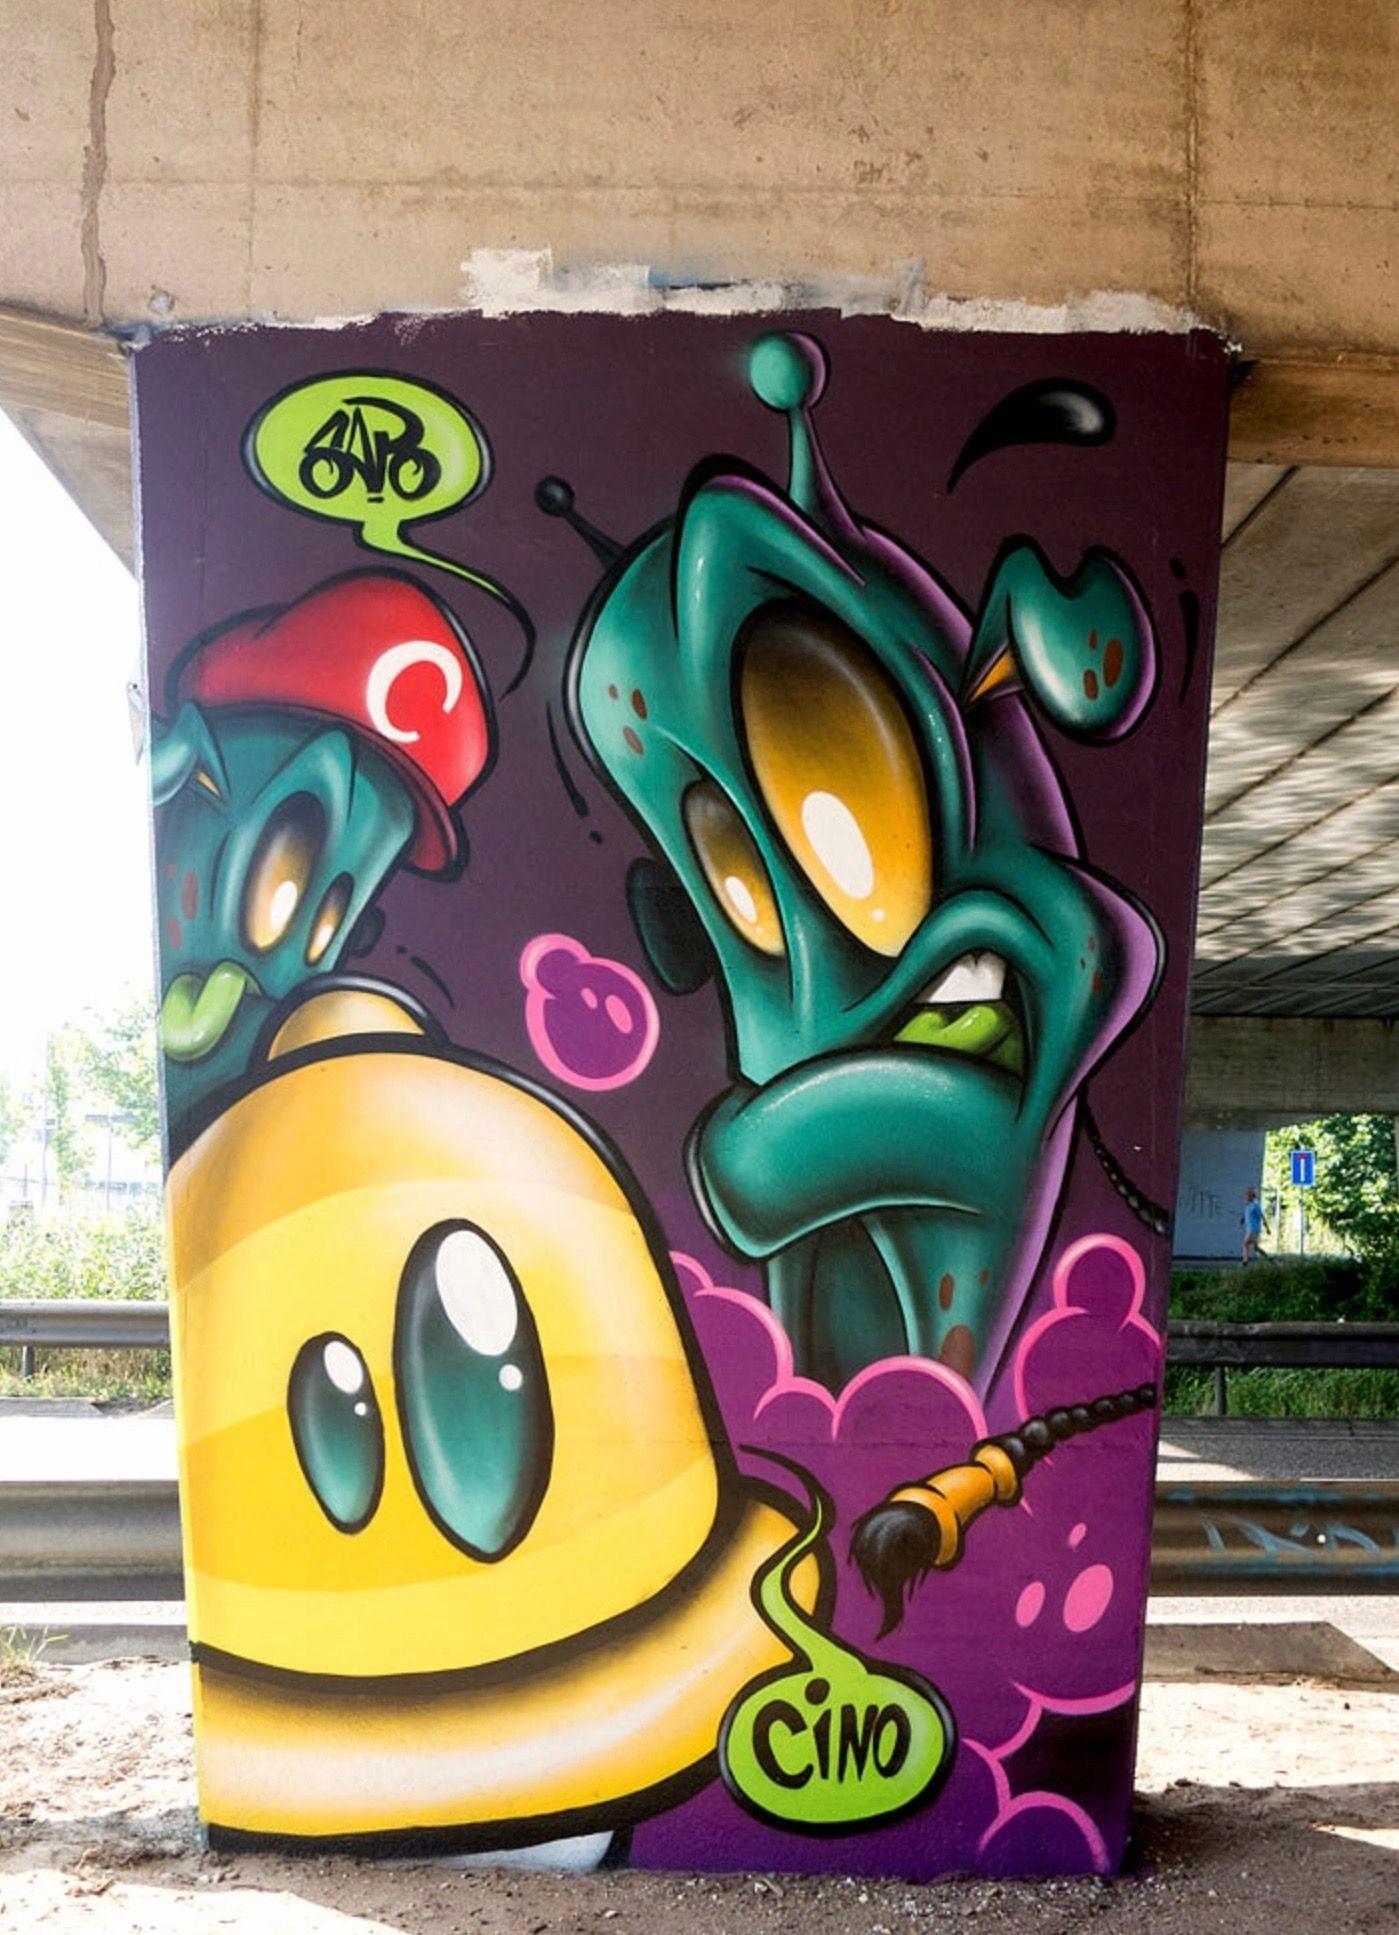 Pin By Teacup Mug On City Street Art Graffiti Graffiti Art